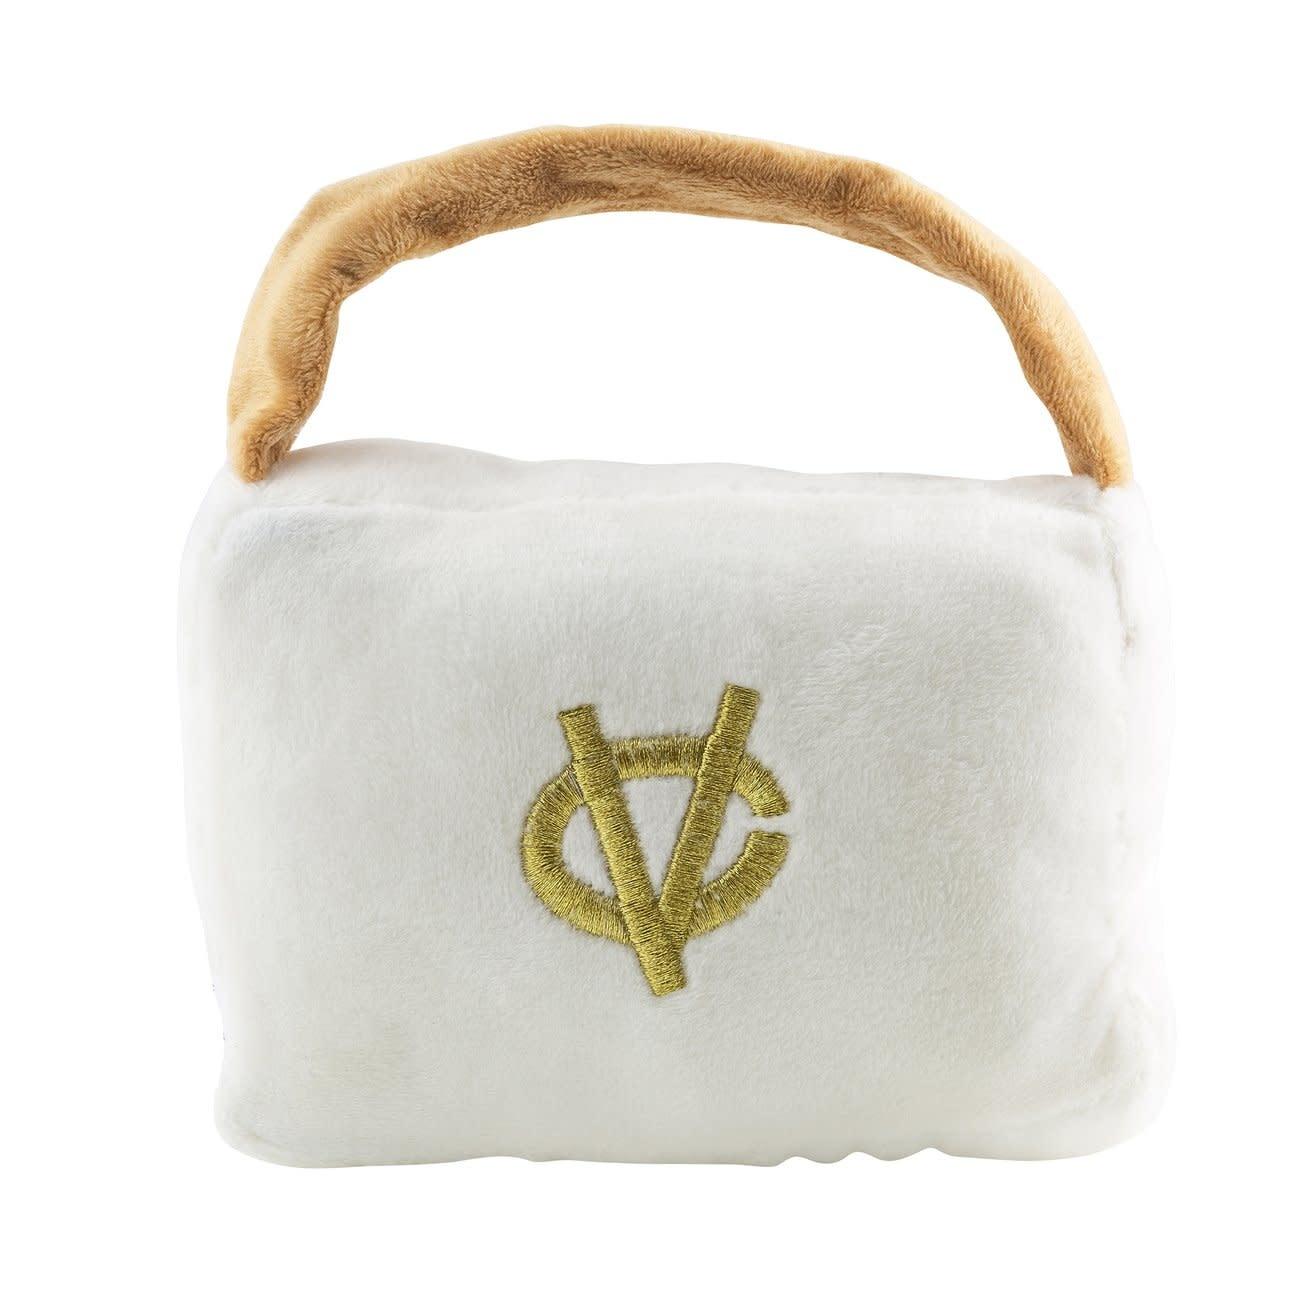 Chewy Vuiton Purse White LG